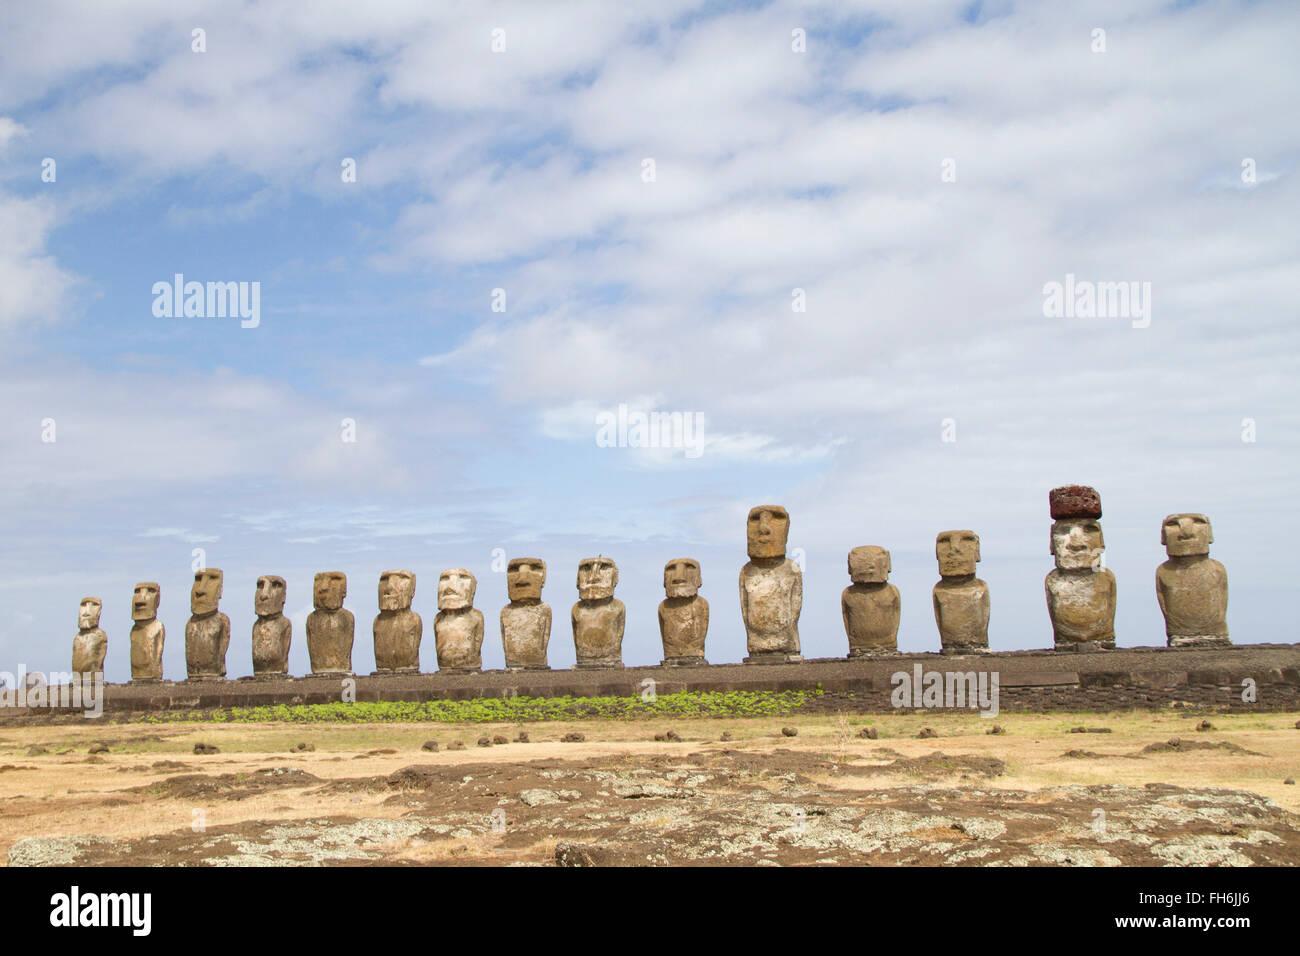 Quince moai (estatuas) sobre la plataforma en Ahu Tongariki Isla de Pascua, Chile Imagen De Stock